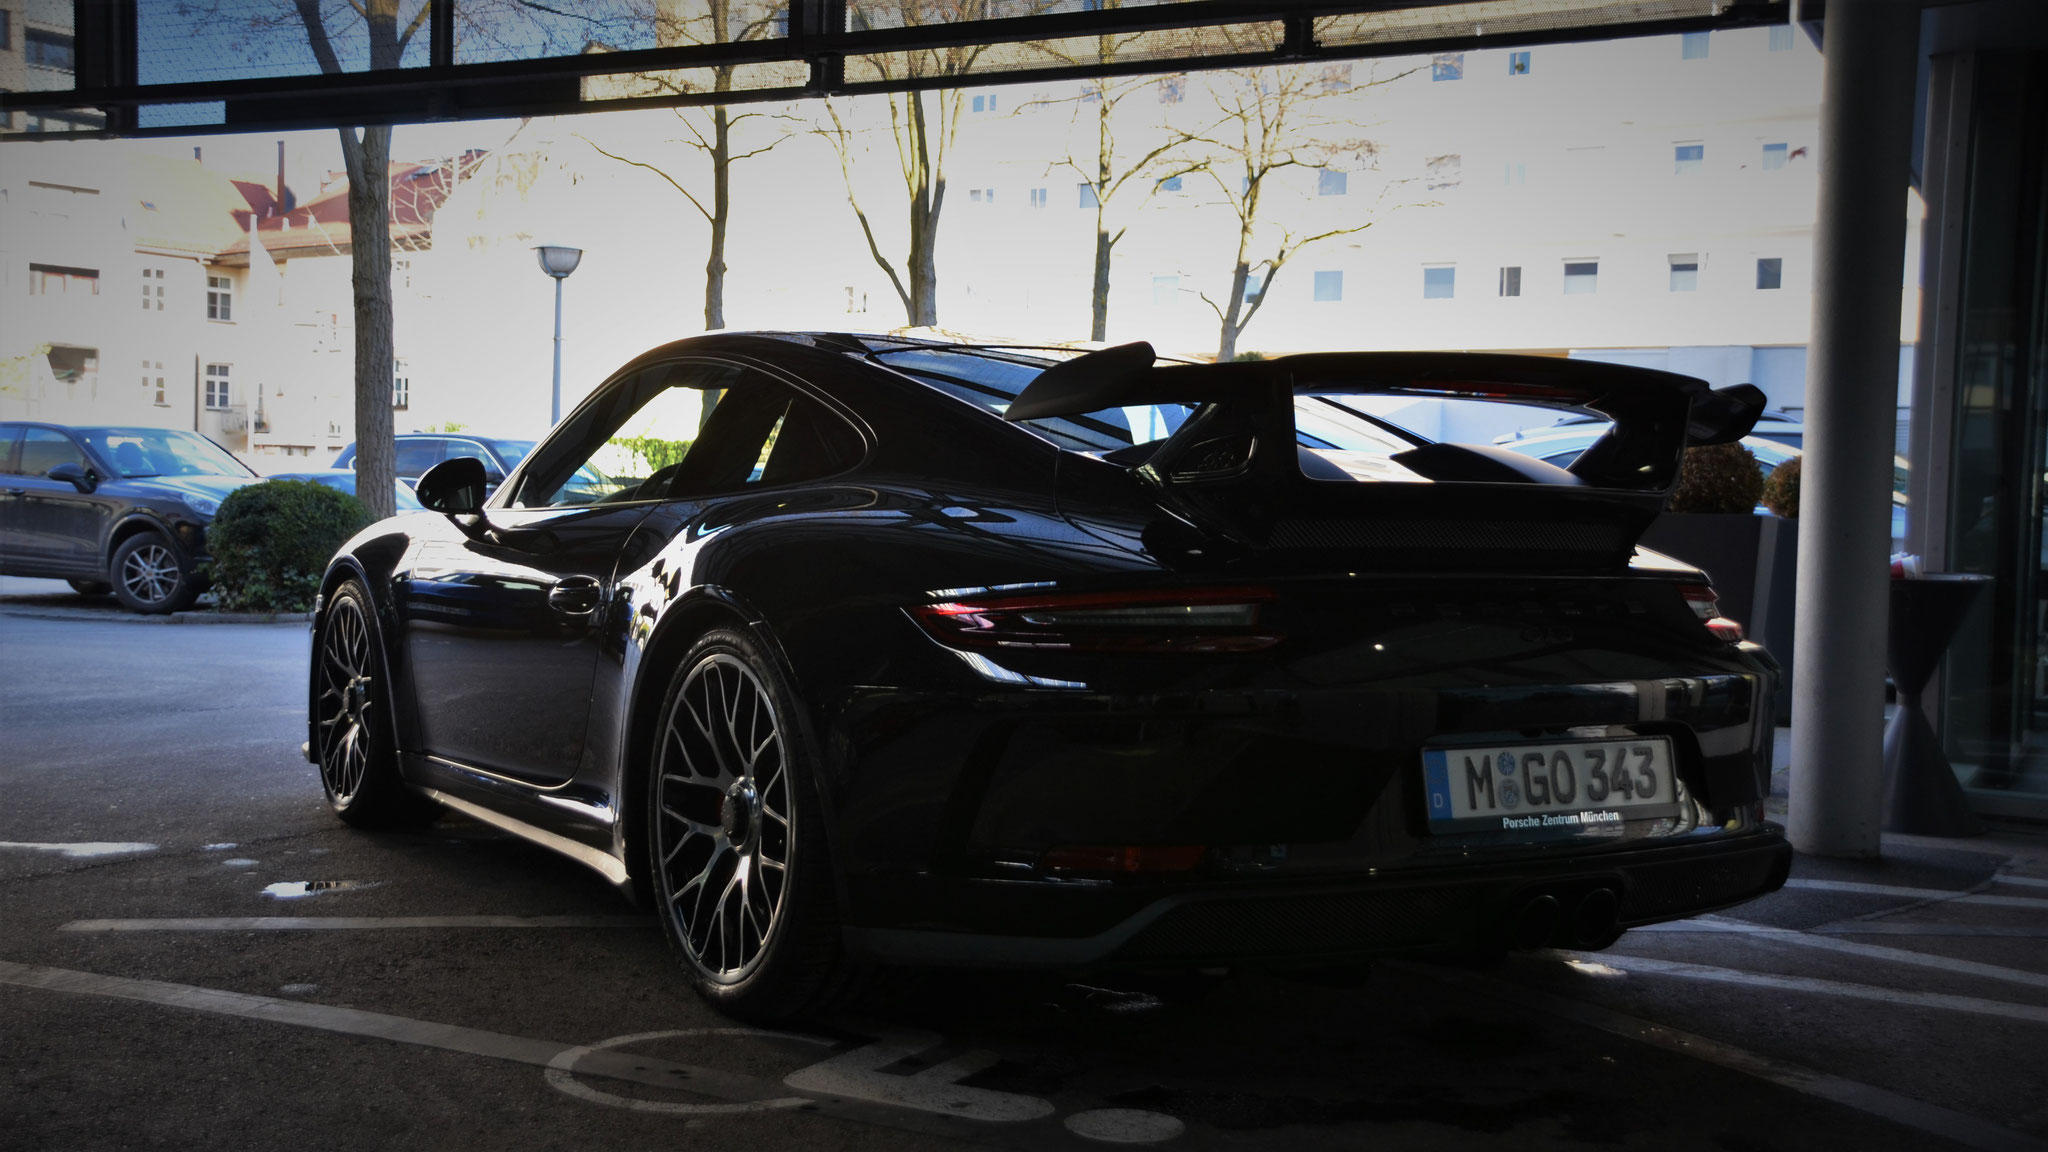 Porsche 991 GT3 - M-GO-343